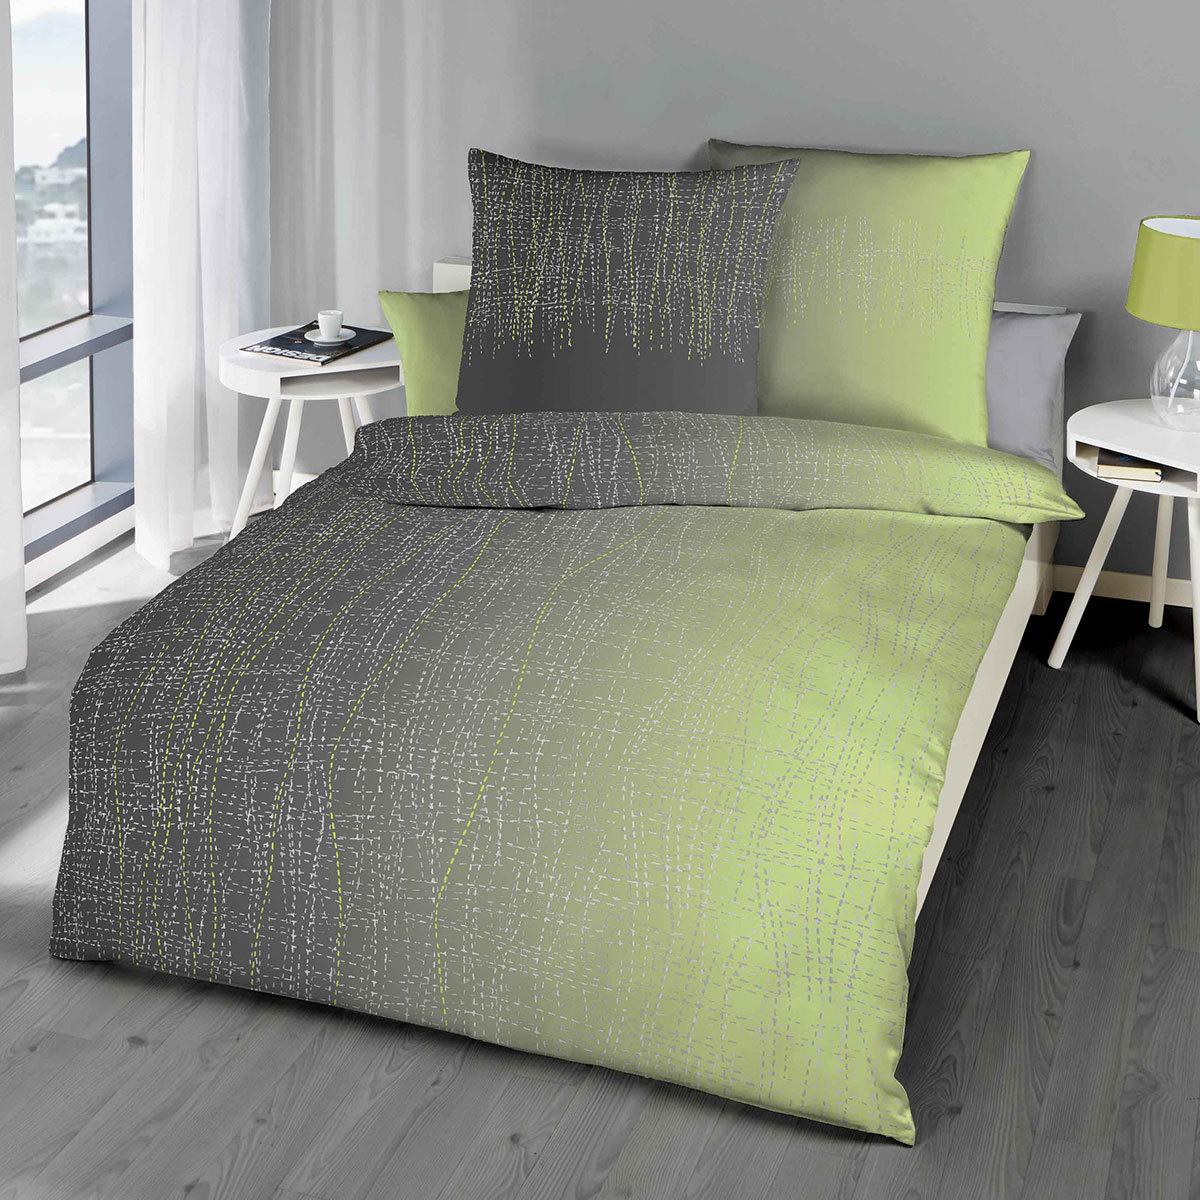 bettwäsche türkis grün grau – Home Image Ideen